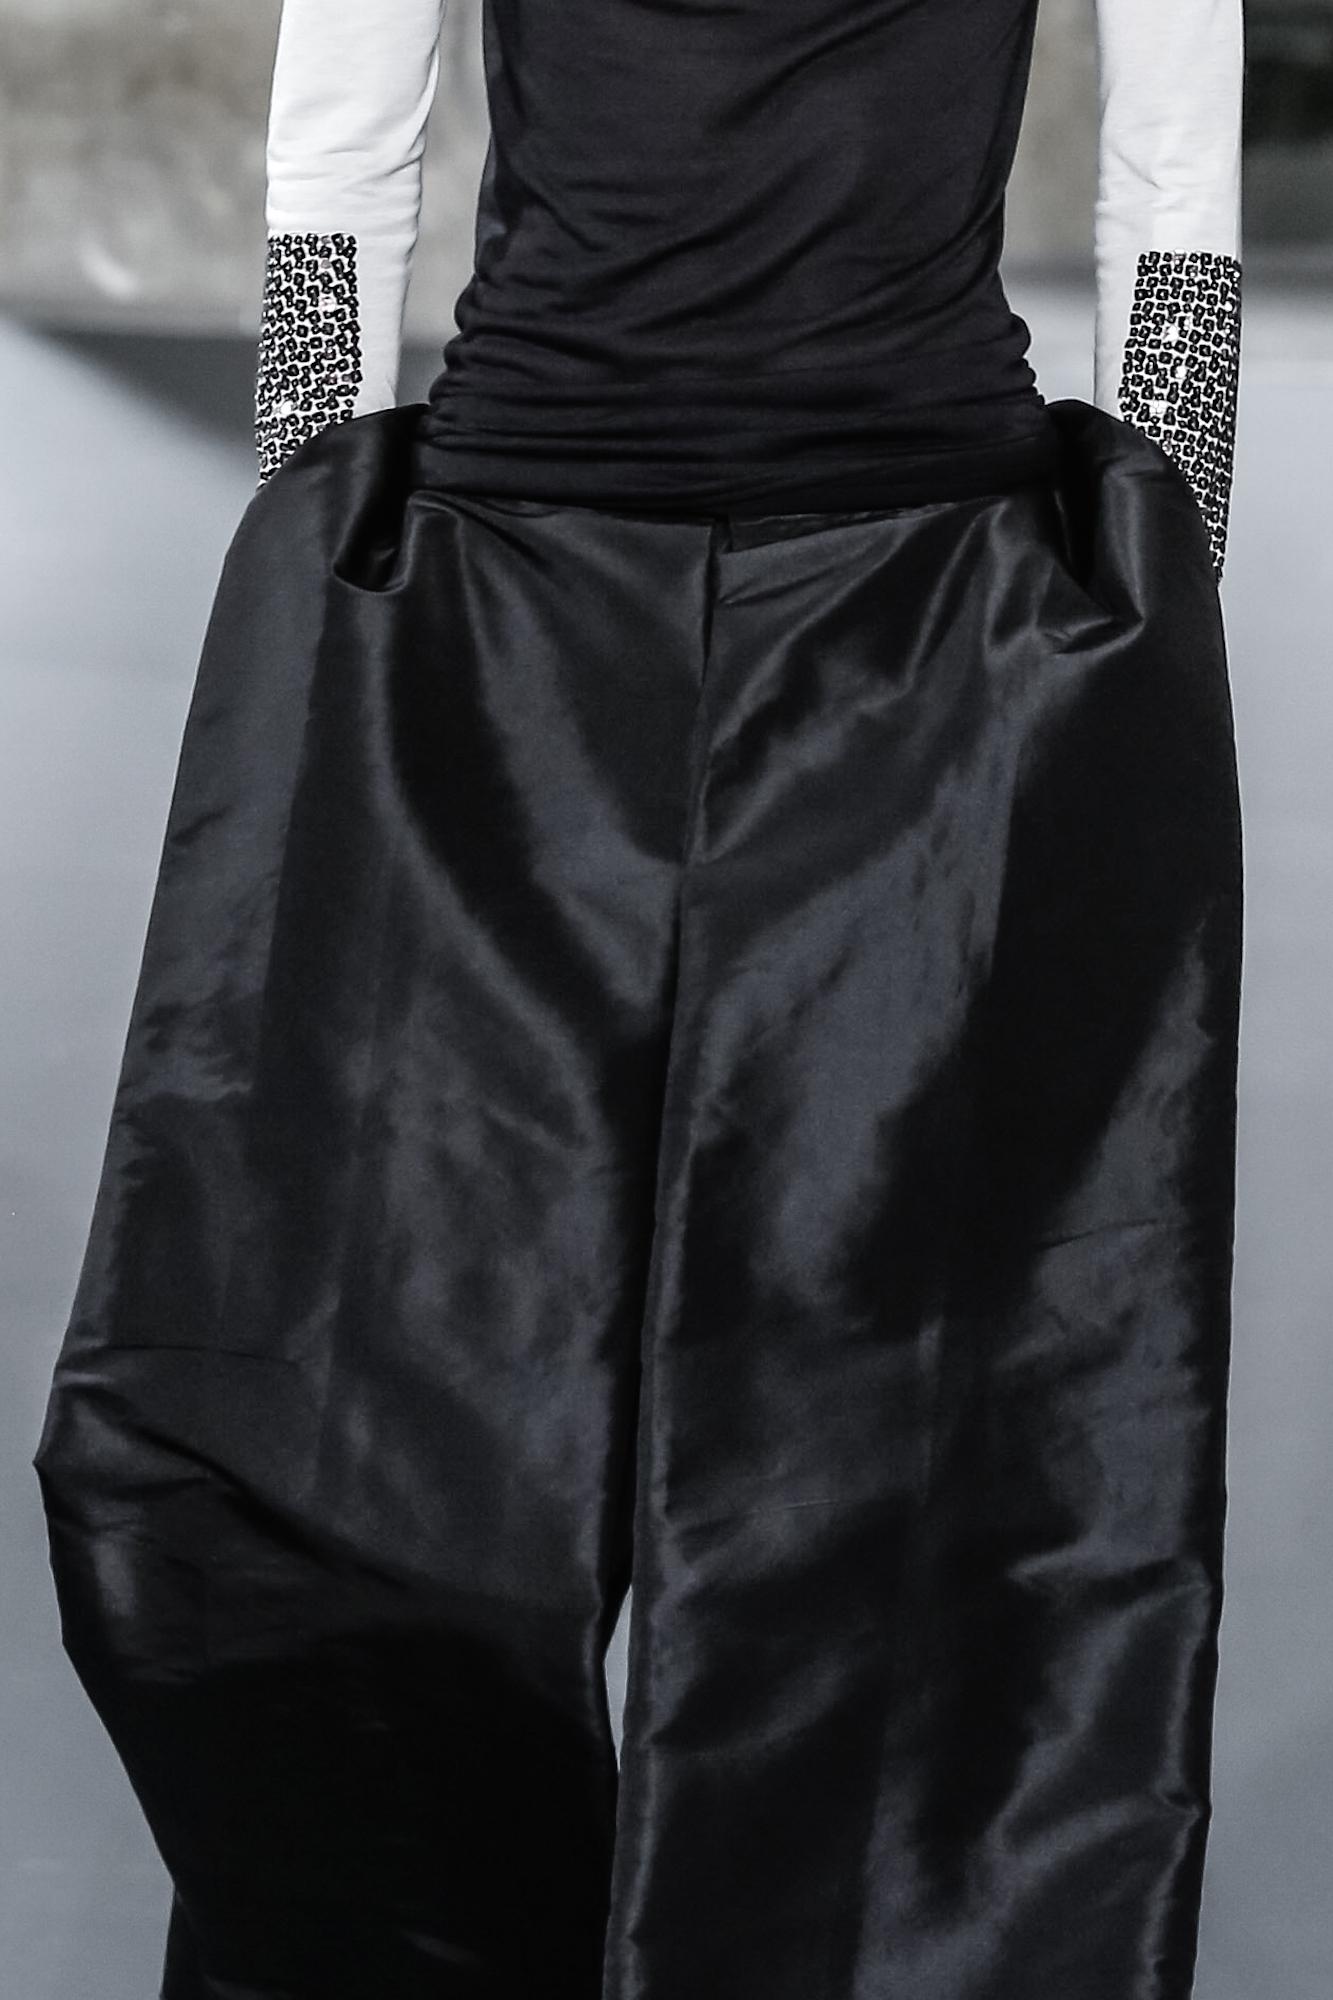 Original 22 pants